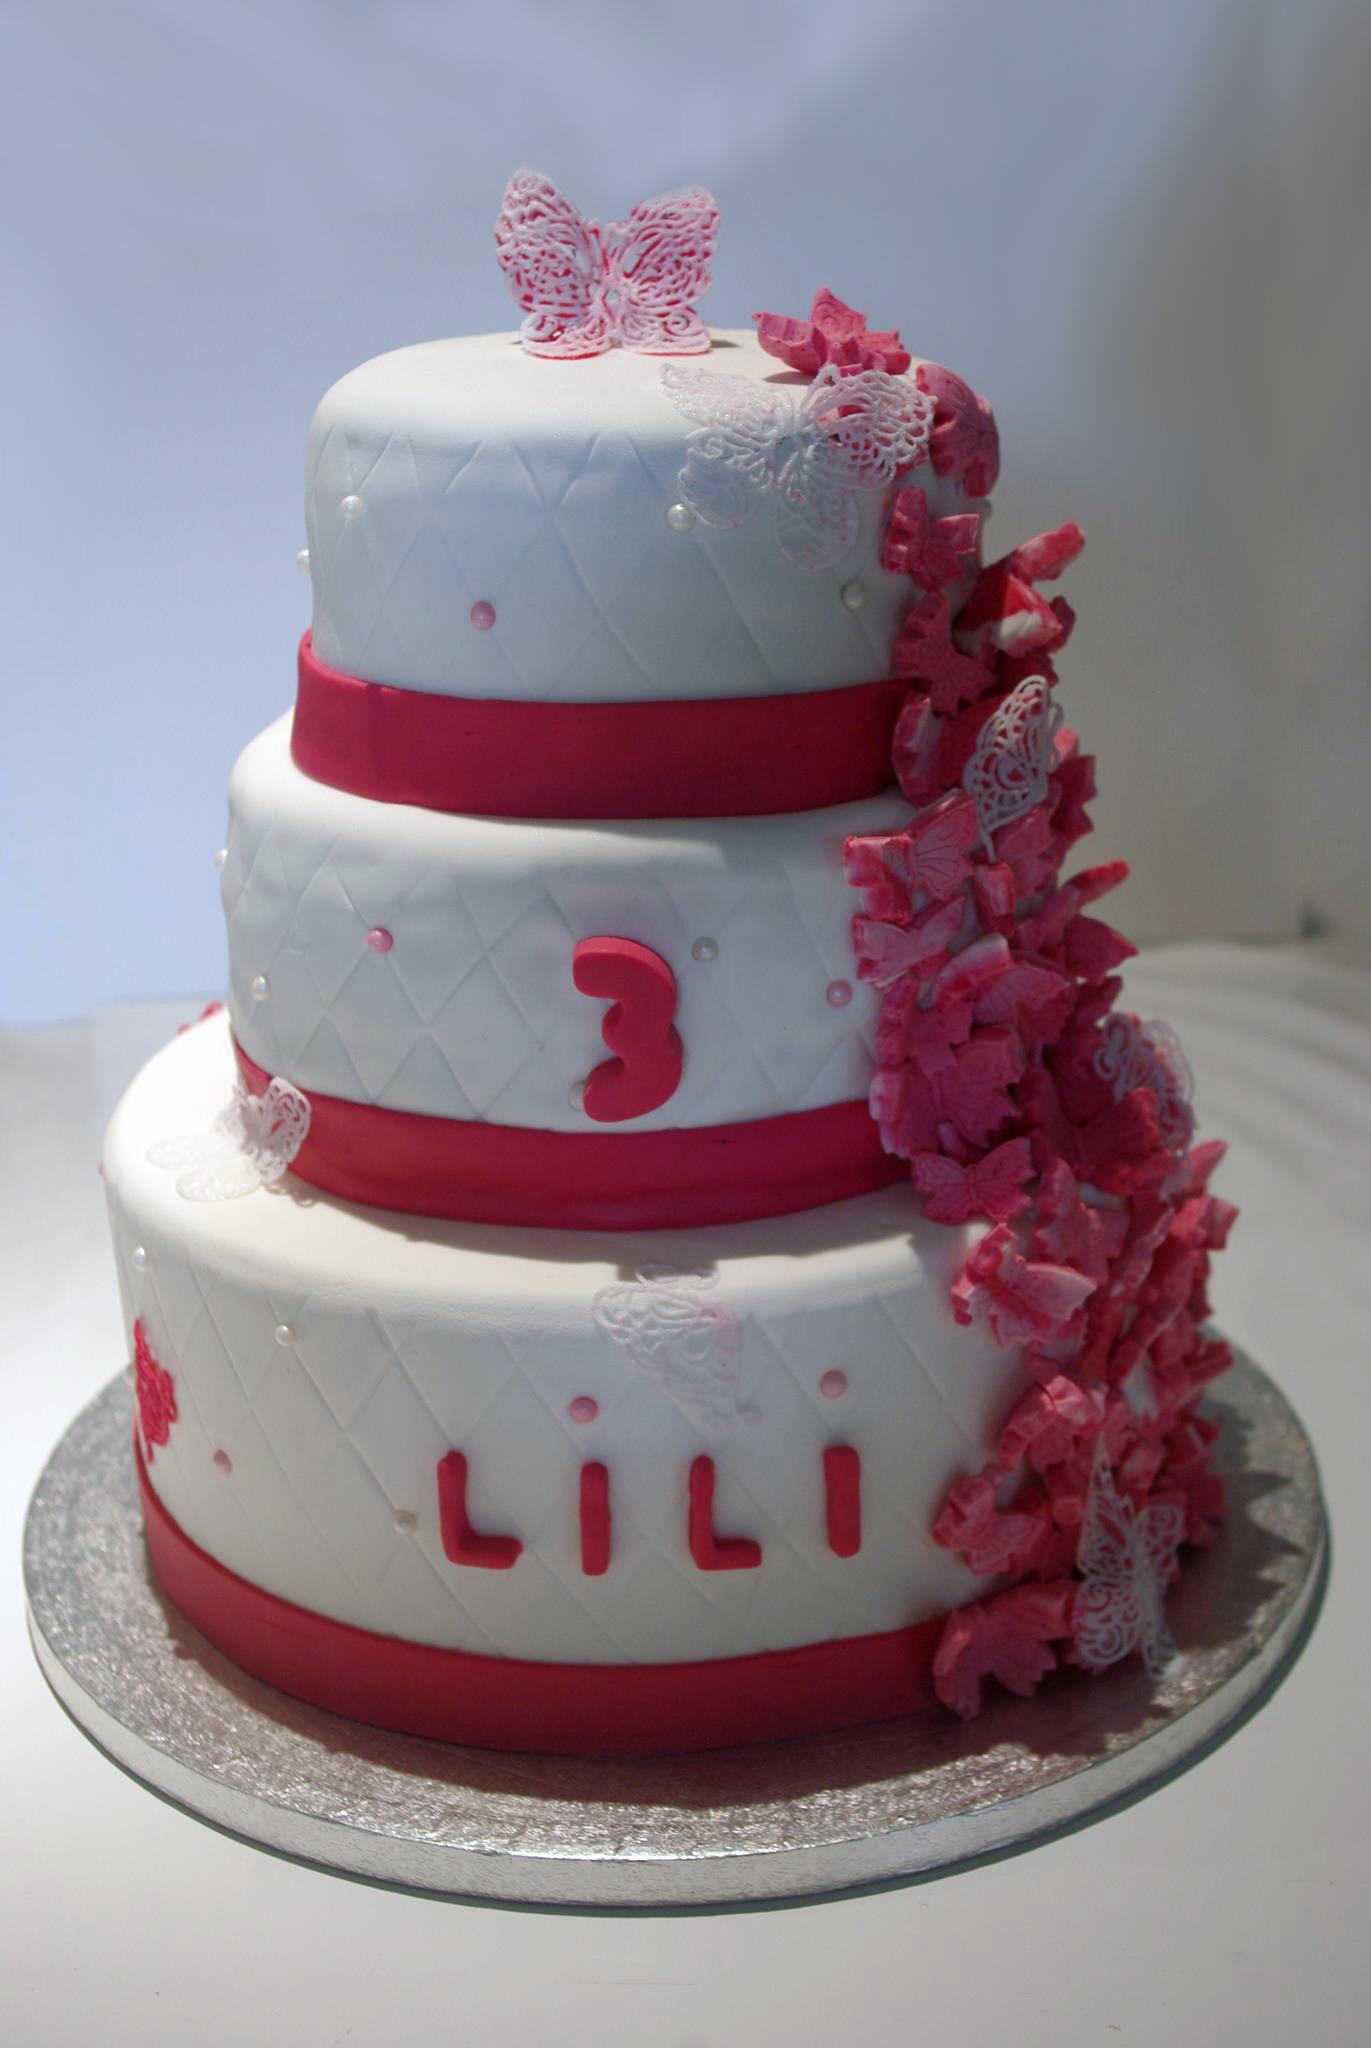 Cake design Lili 3 ans